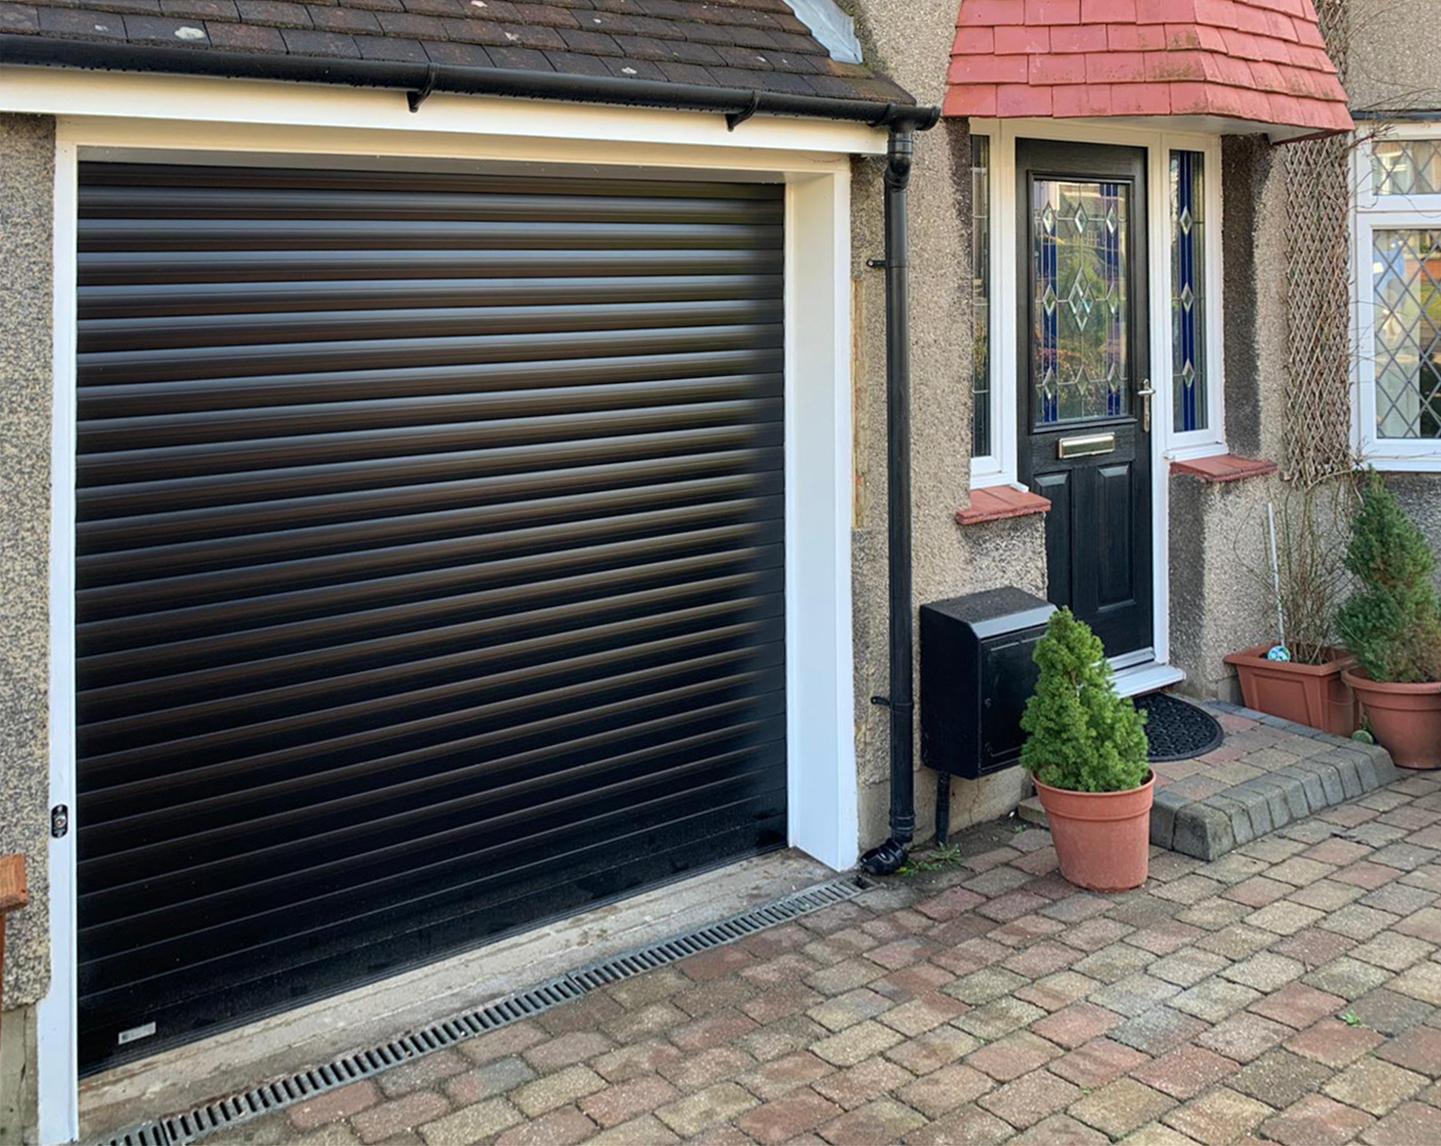 SWS SeceuroGlide Roller Garage Door Finished in Black